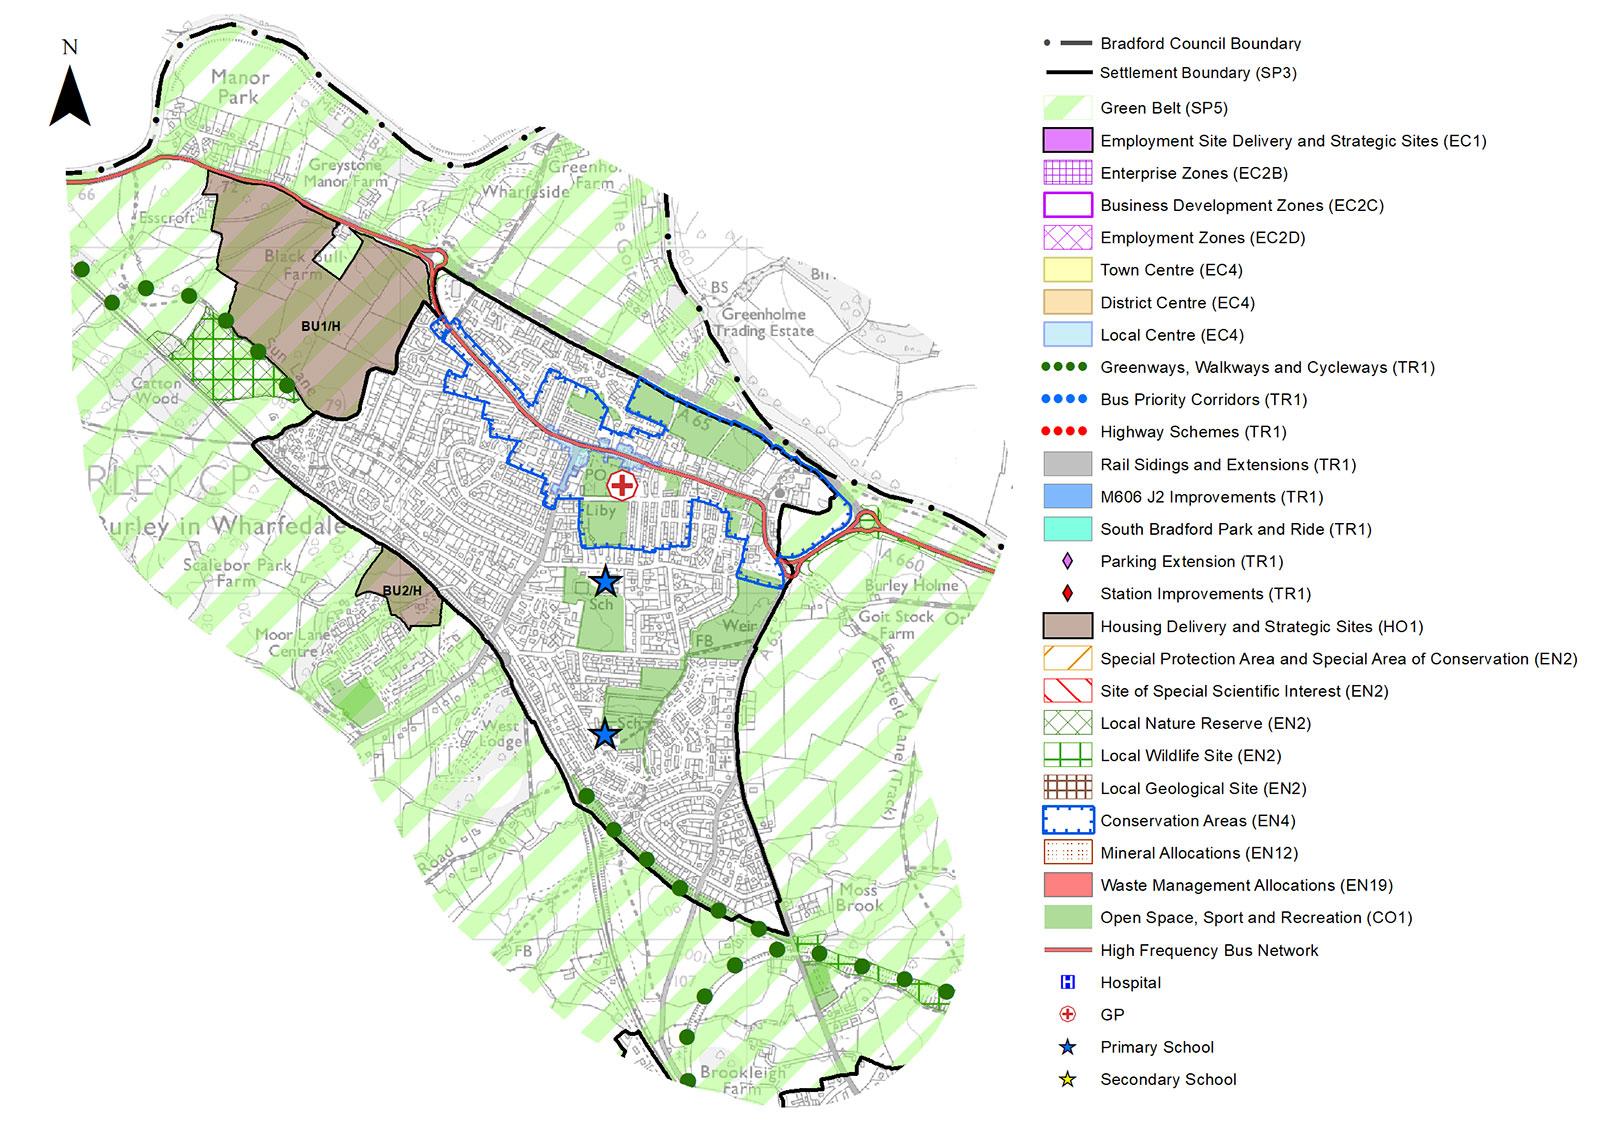 Bradford Local Plan, Burley in Wharfedale